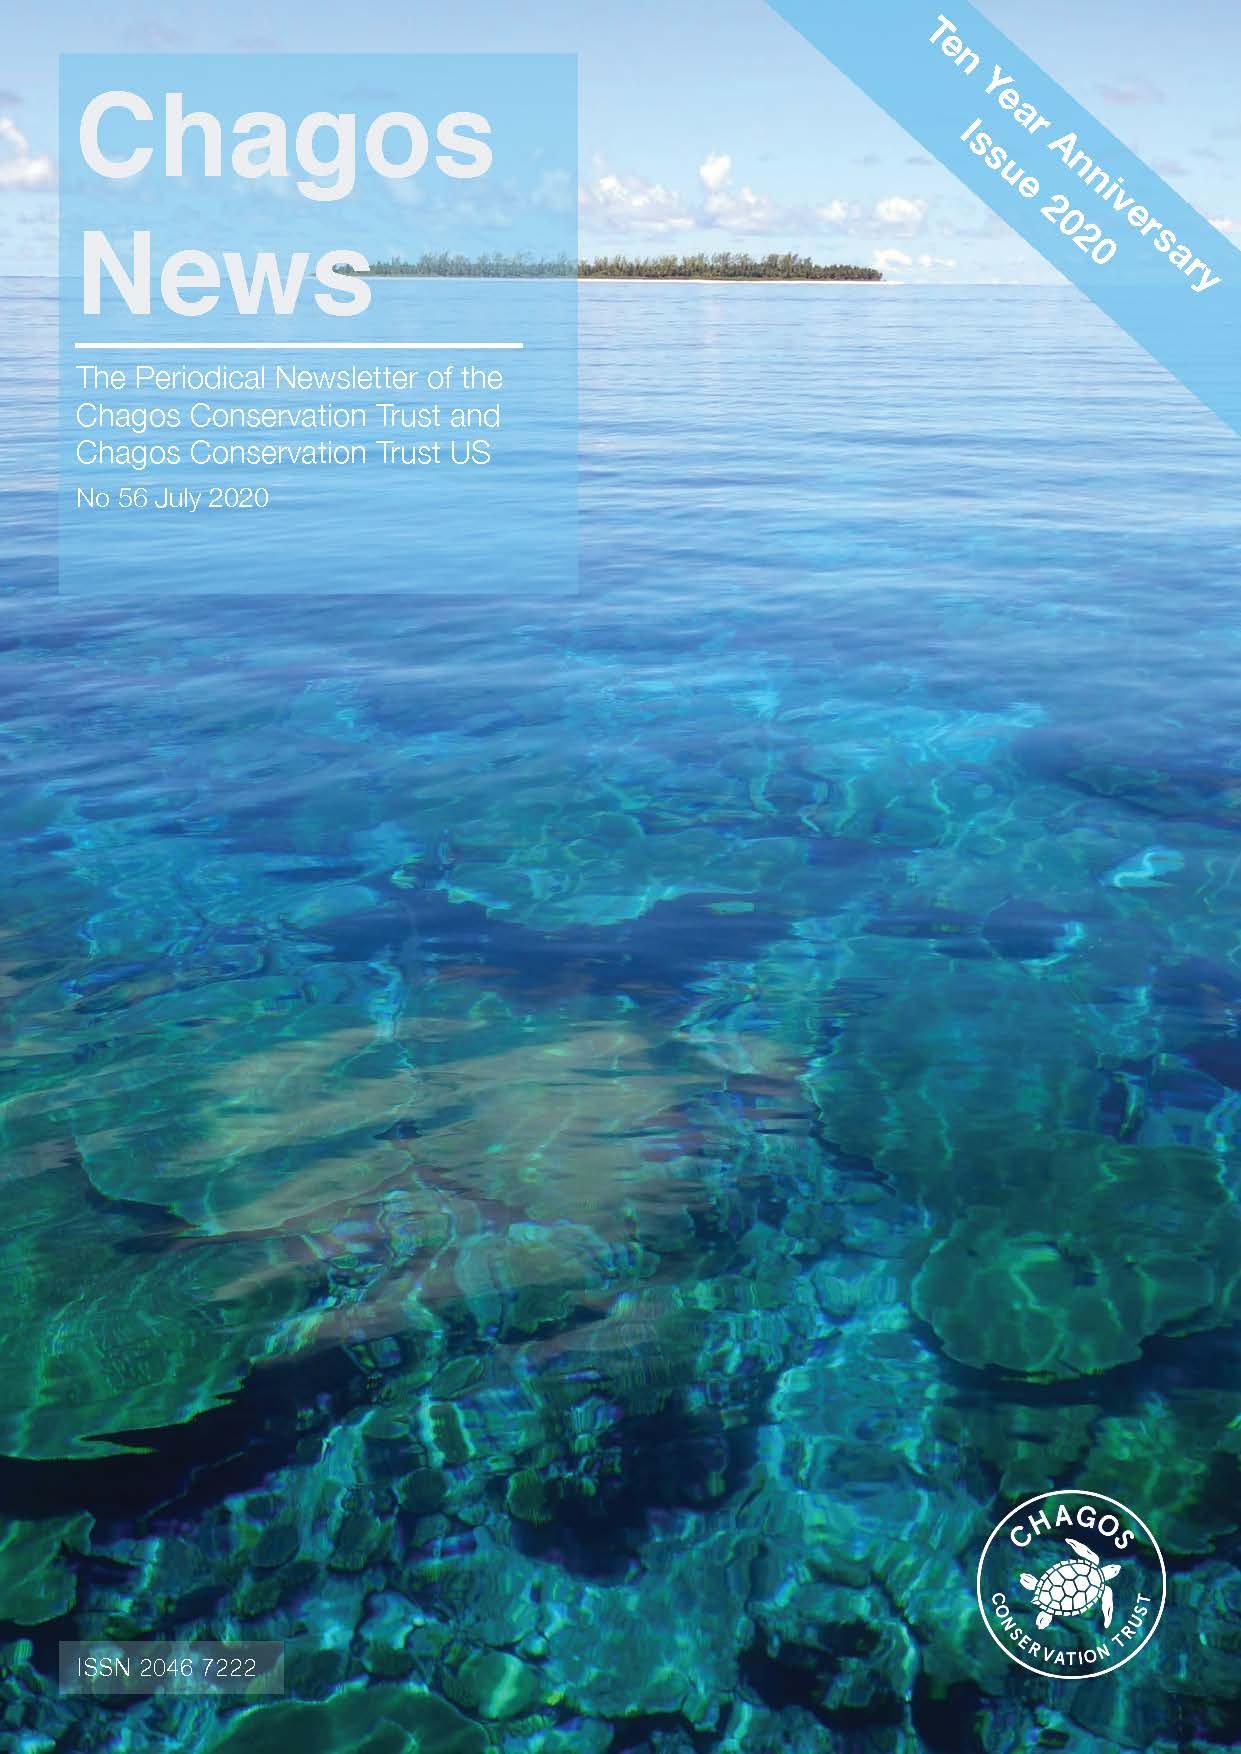 Chagos News issue #56